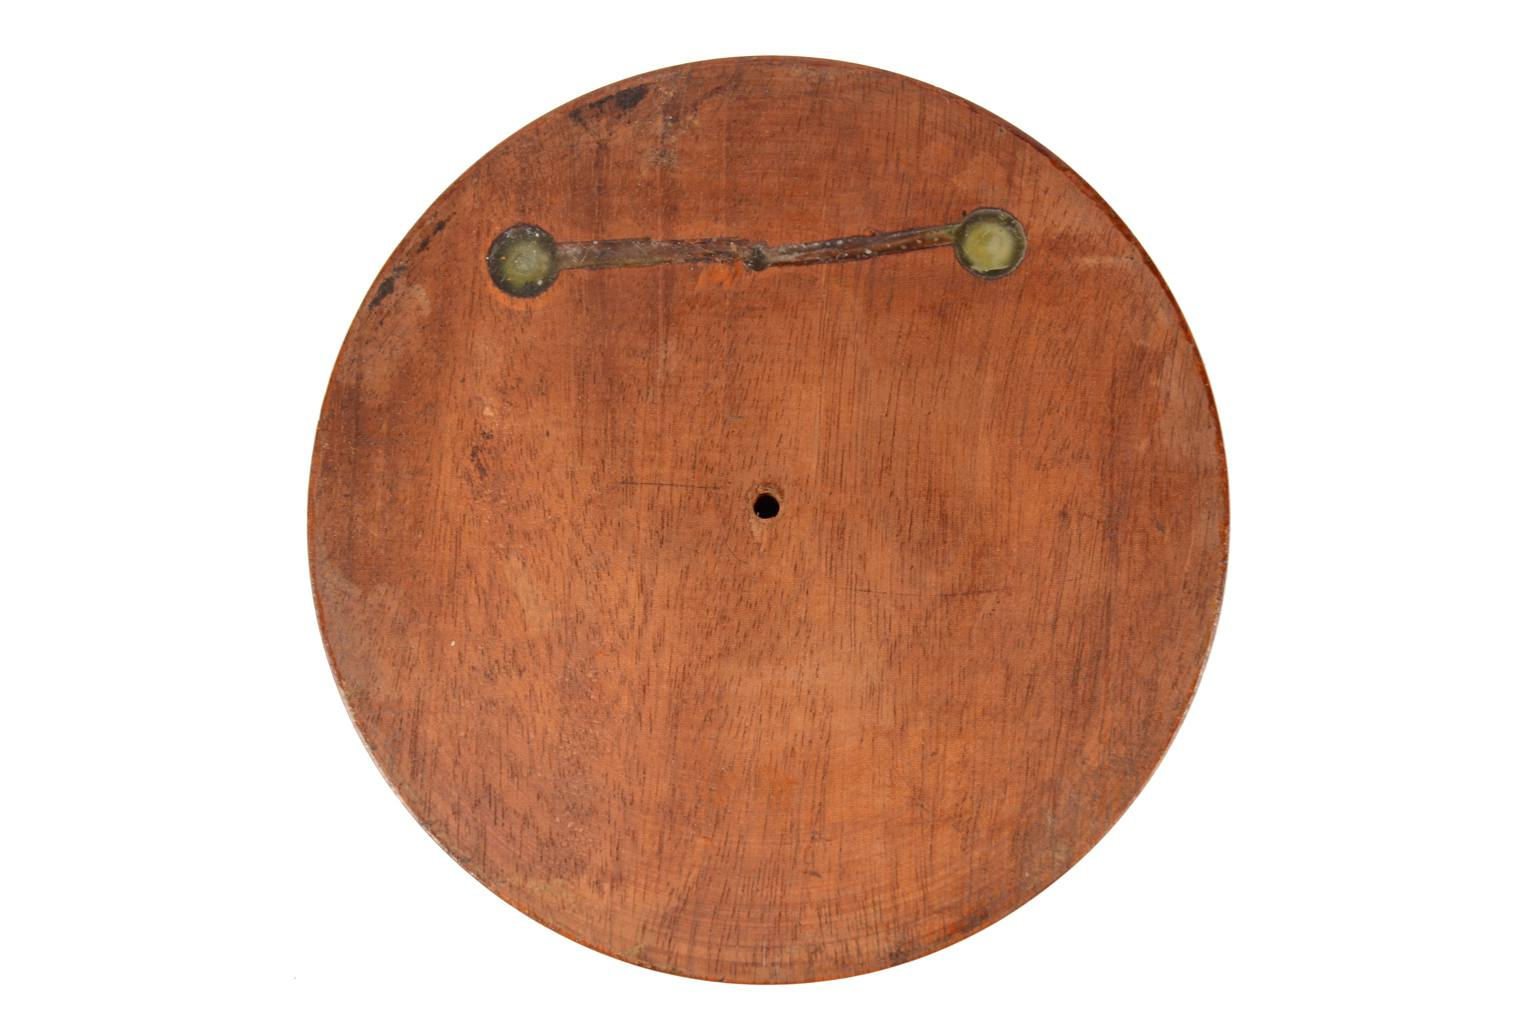 Strumenti di misura antichi/A26-Galvanometro Elliott